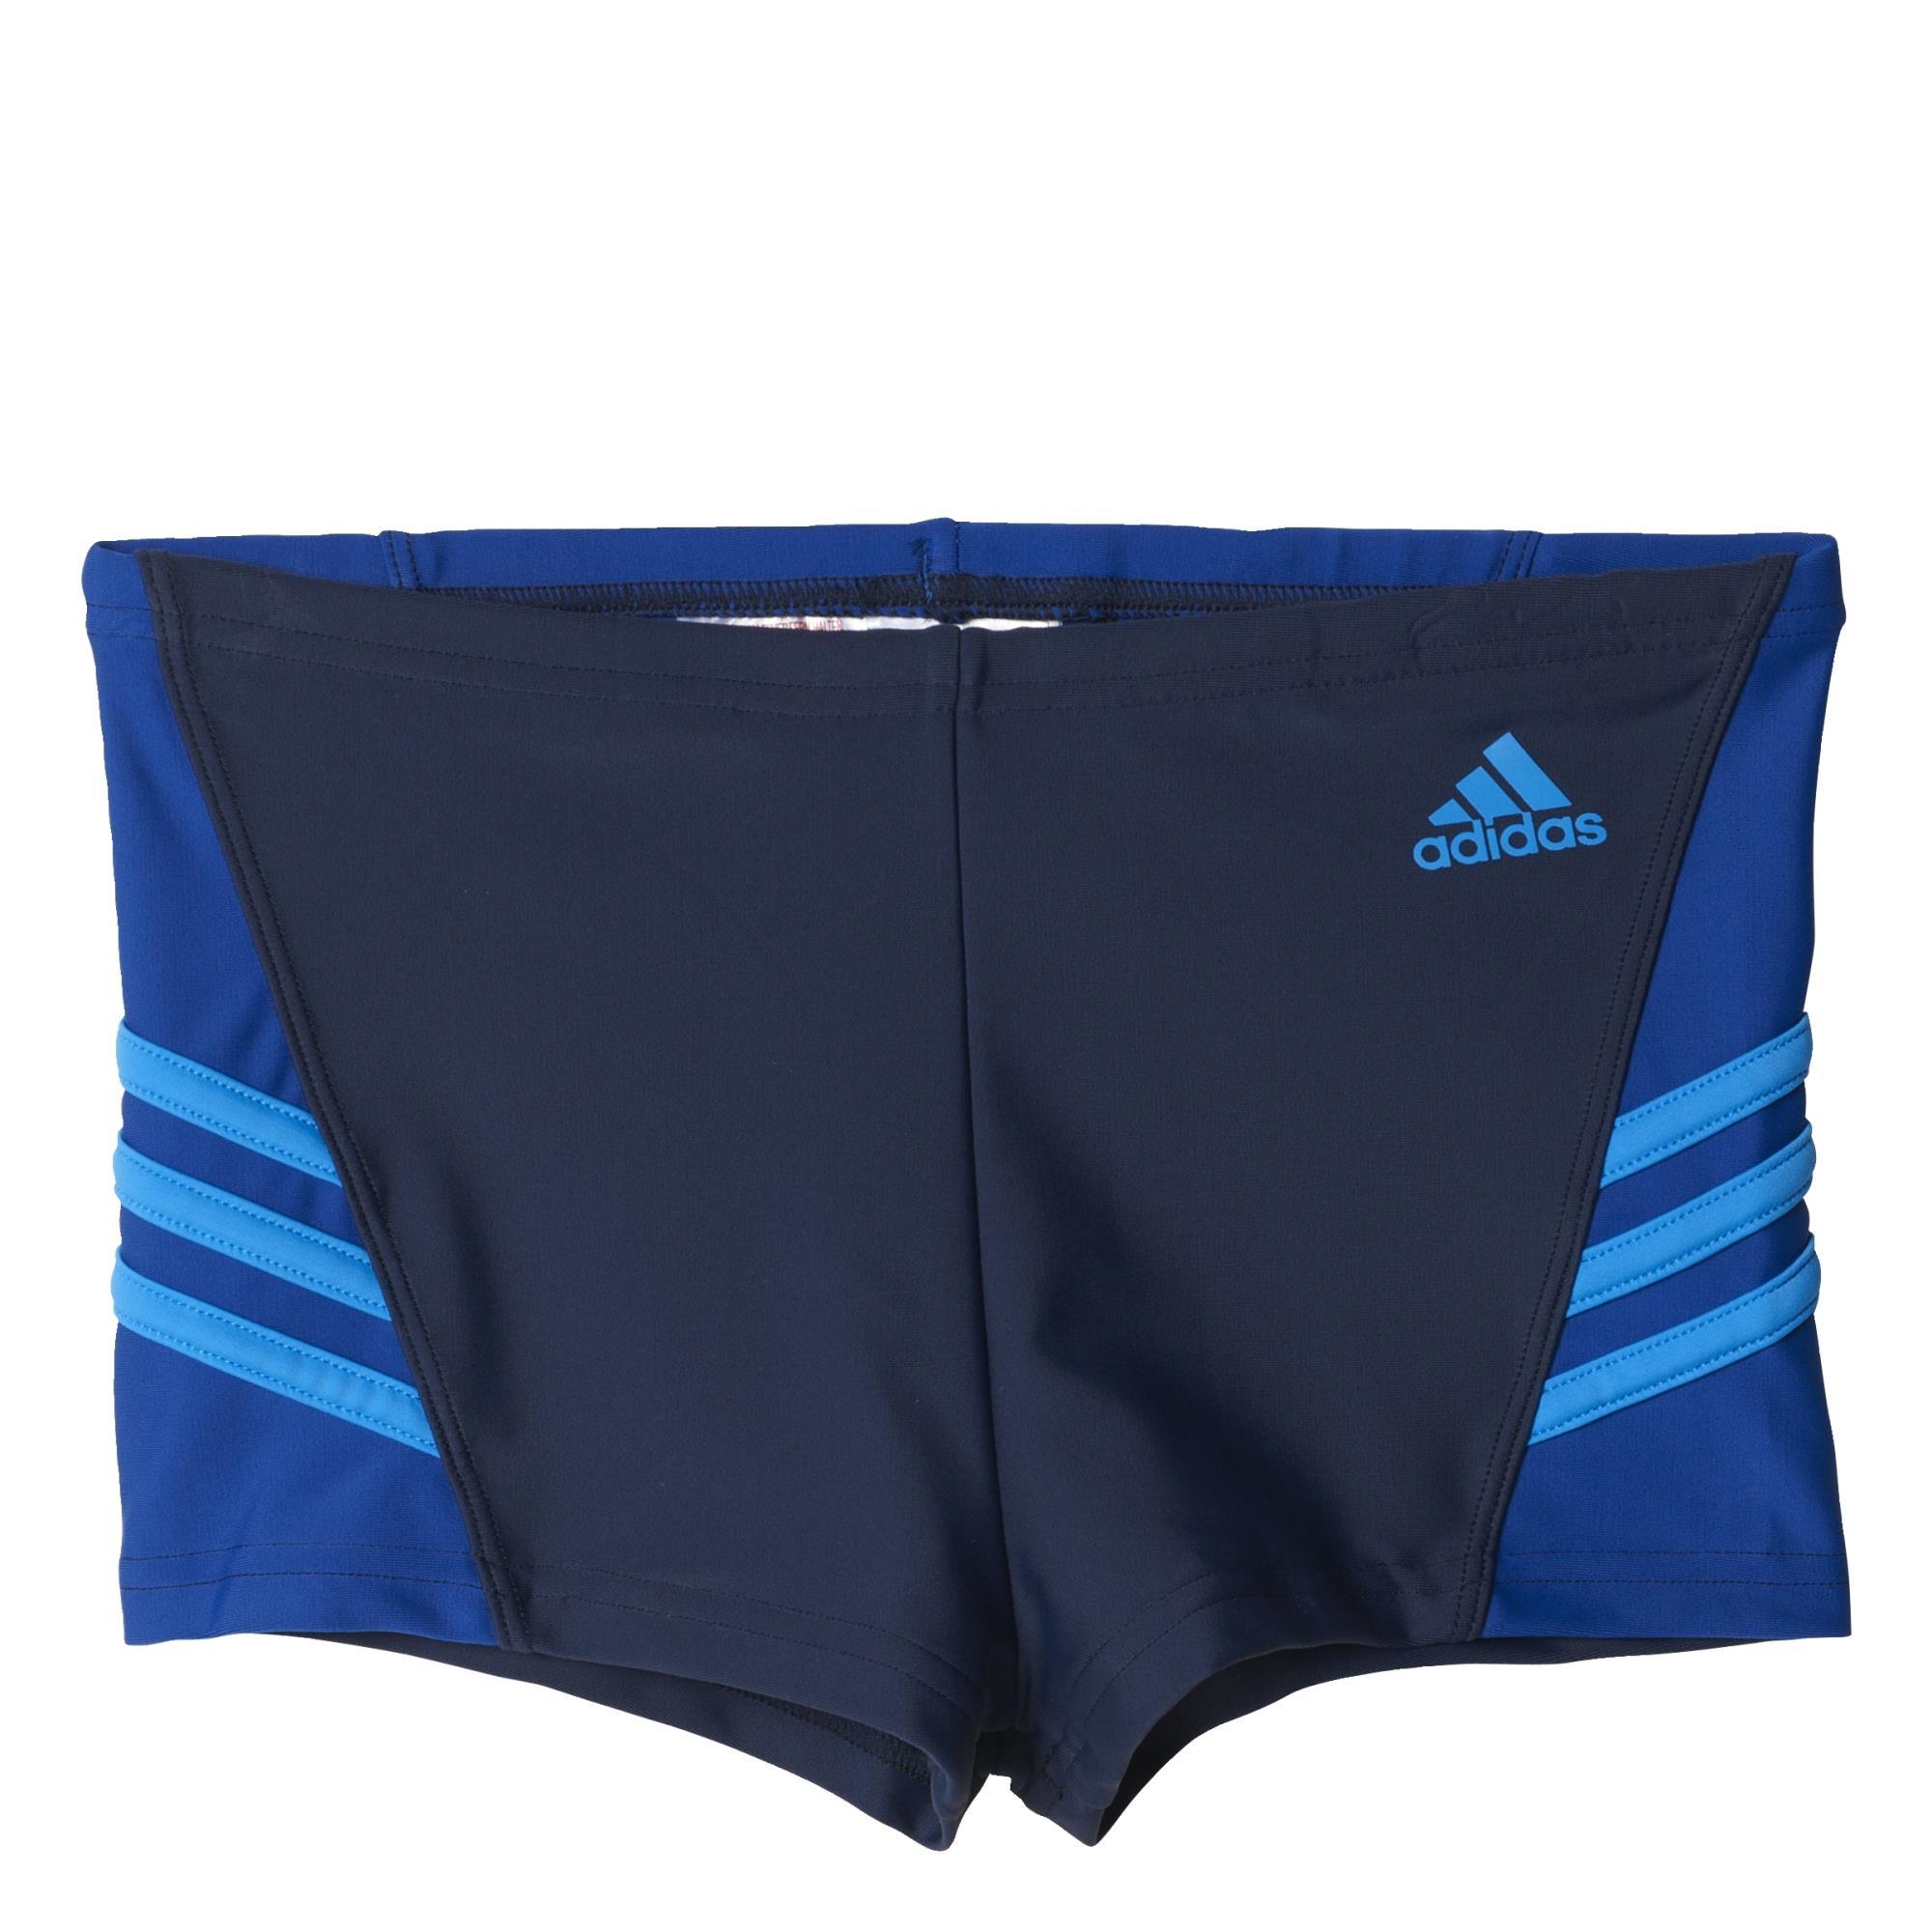 Adidas Ins Bx B Jongens zwemshort